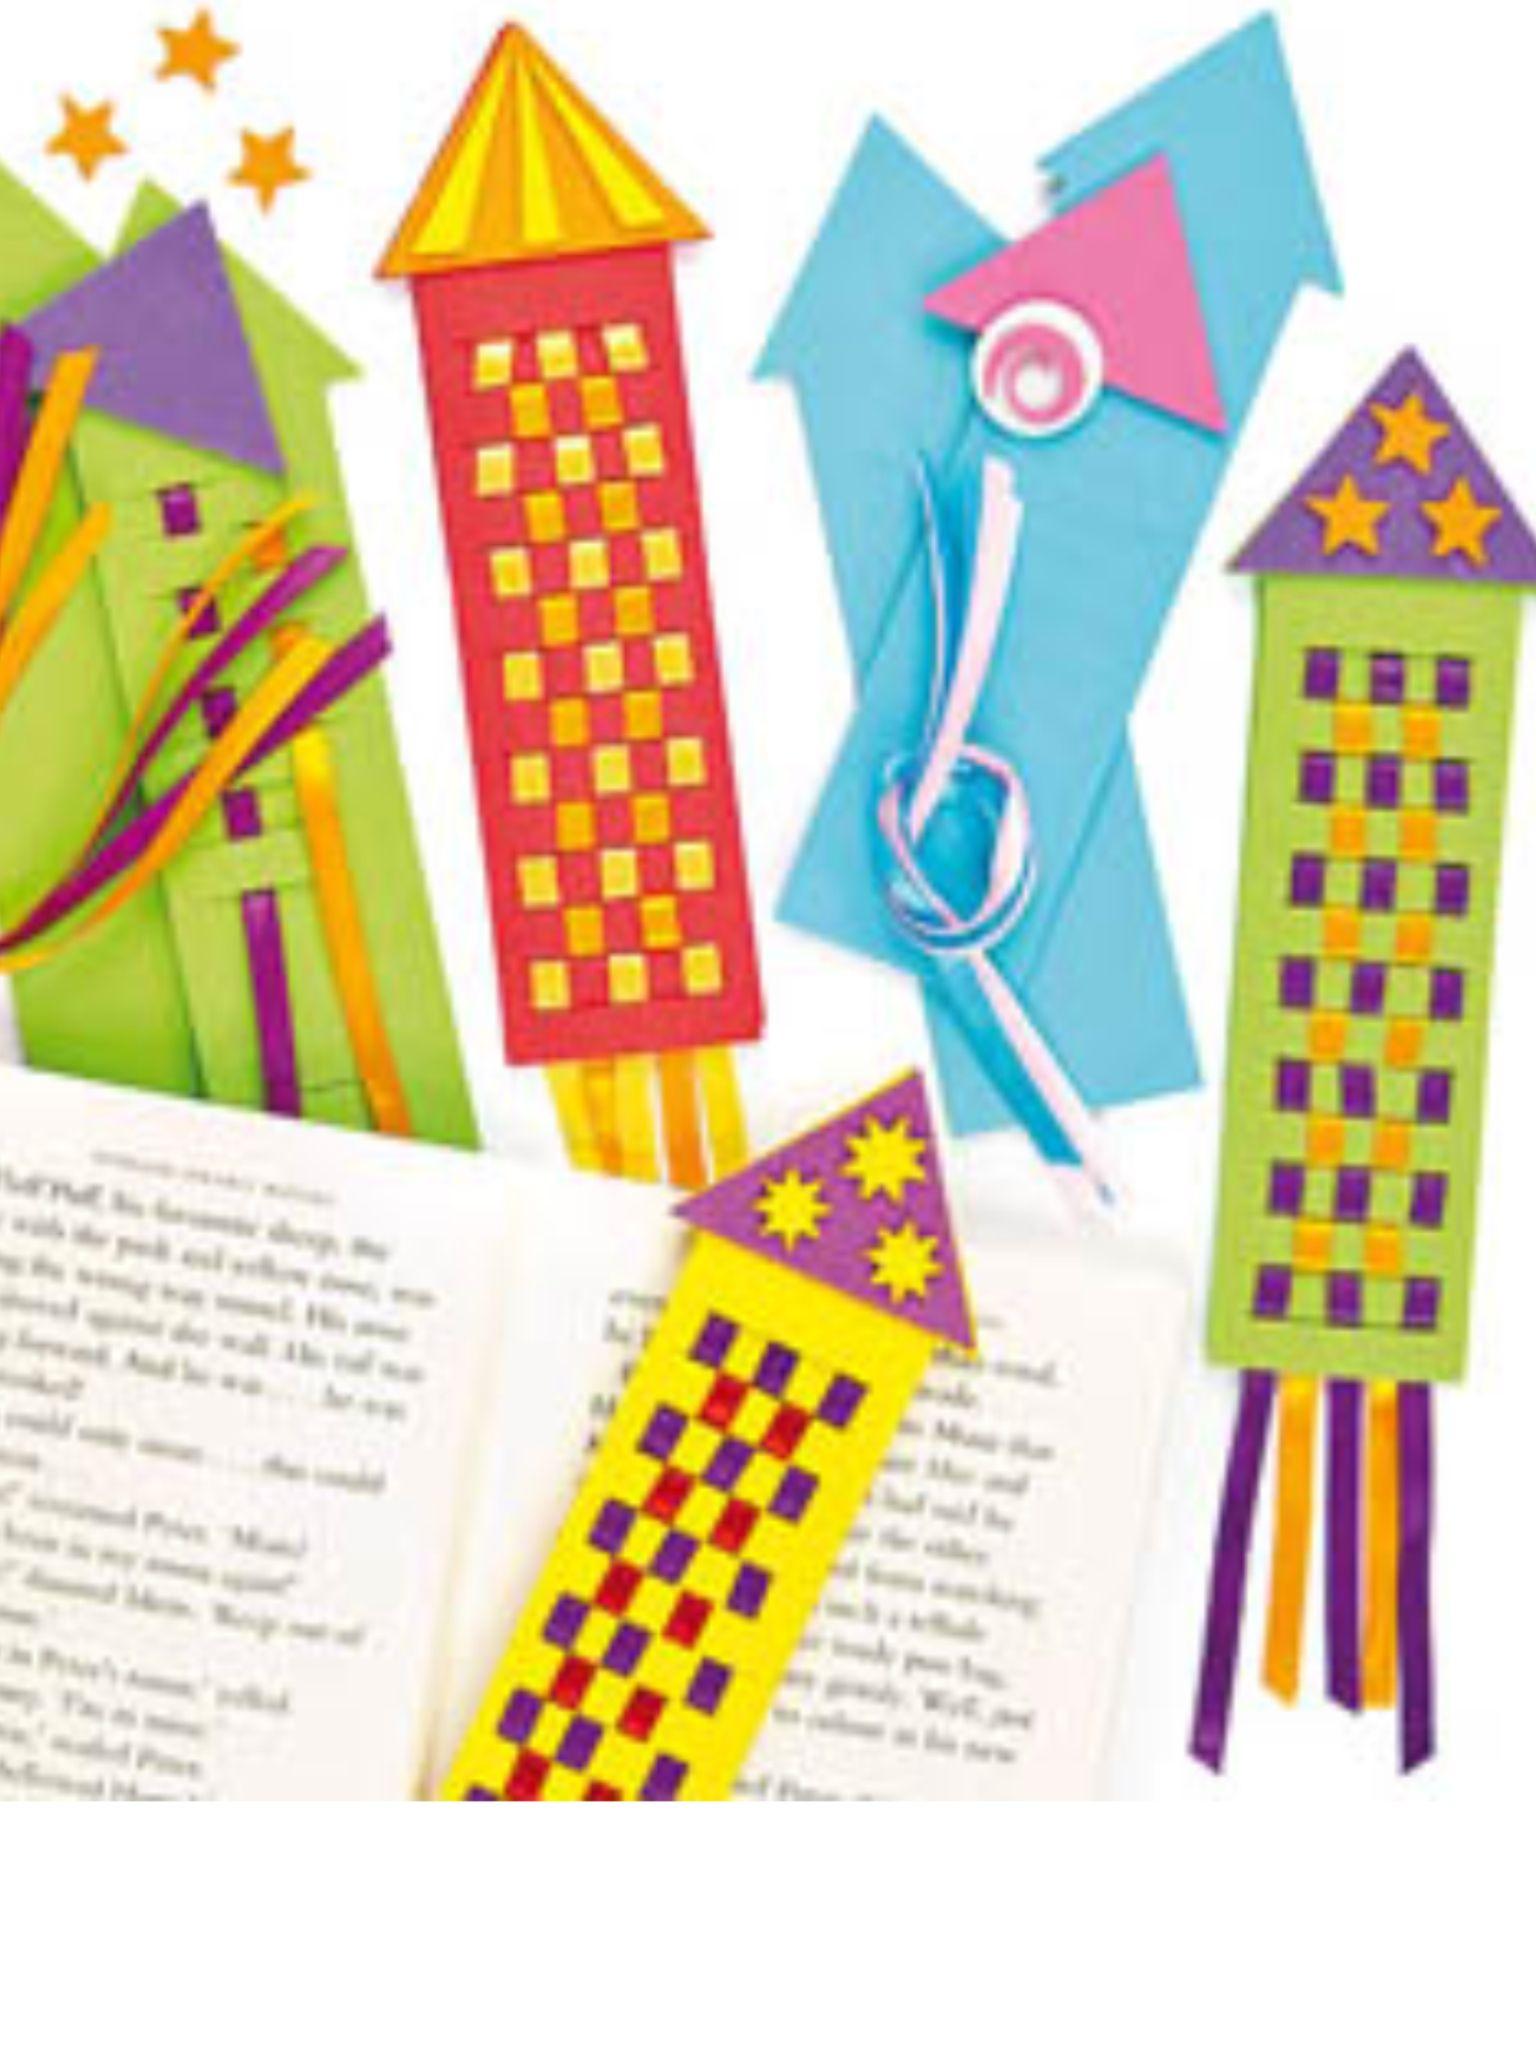 Pin By Emma On Kindergarten Crafts Bookmarks Crafts For Kids